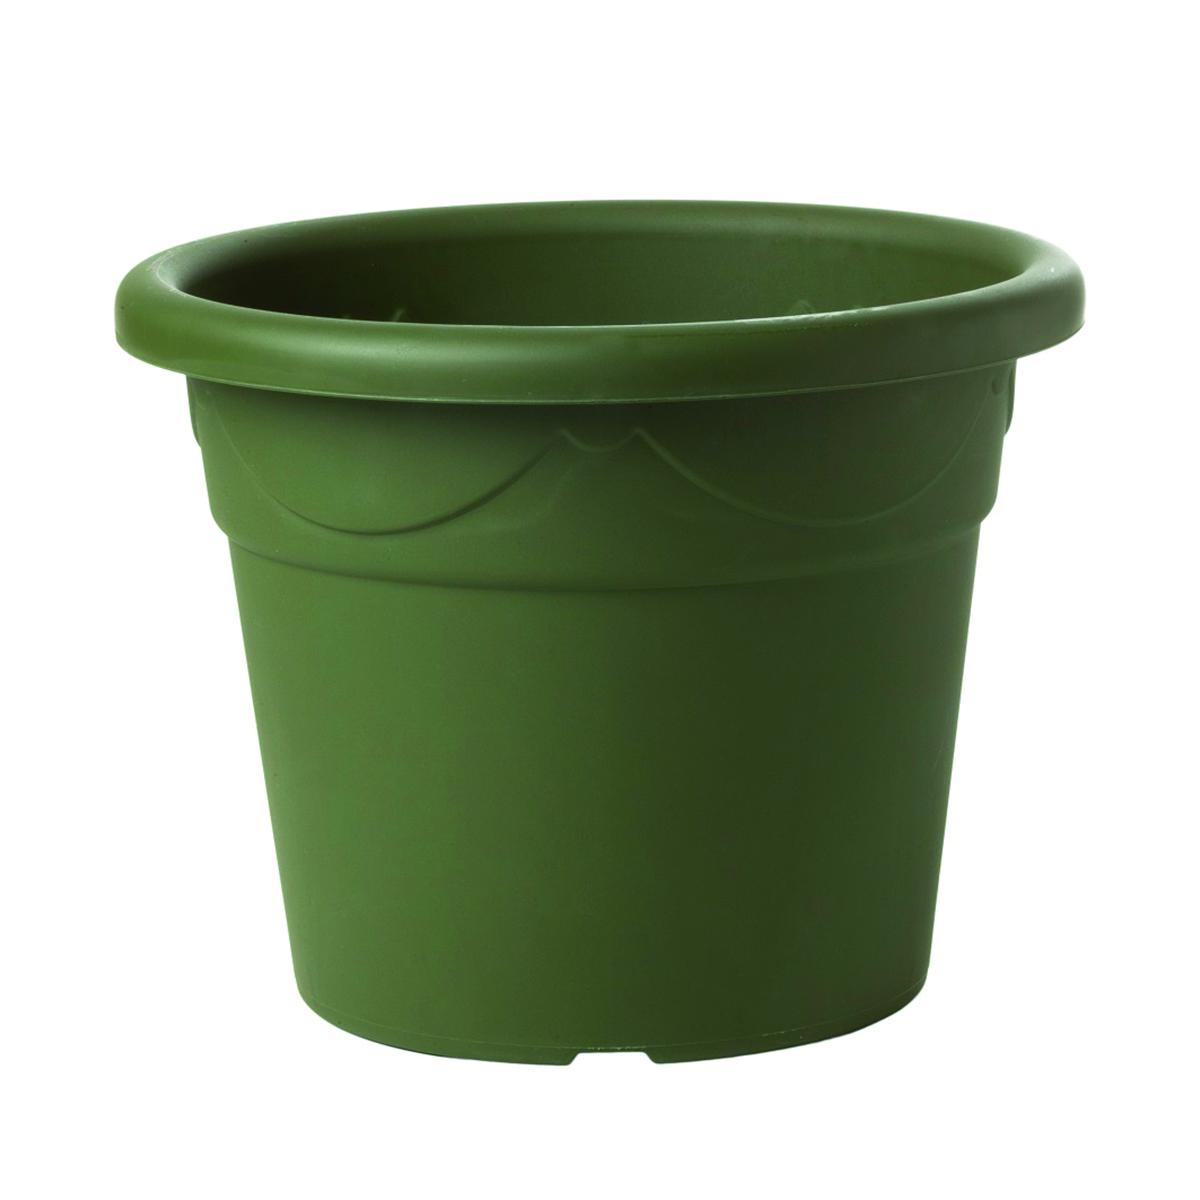 Vaso Corinto in polipropilene colore verde H 42.5 cm, Ø 58 cm